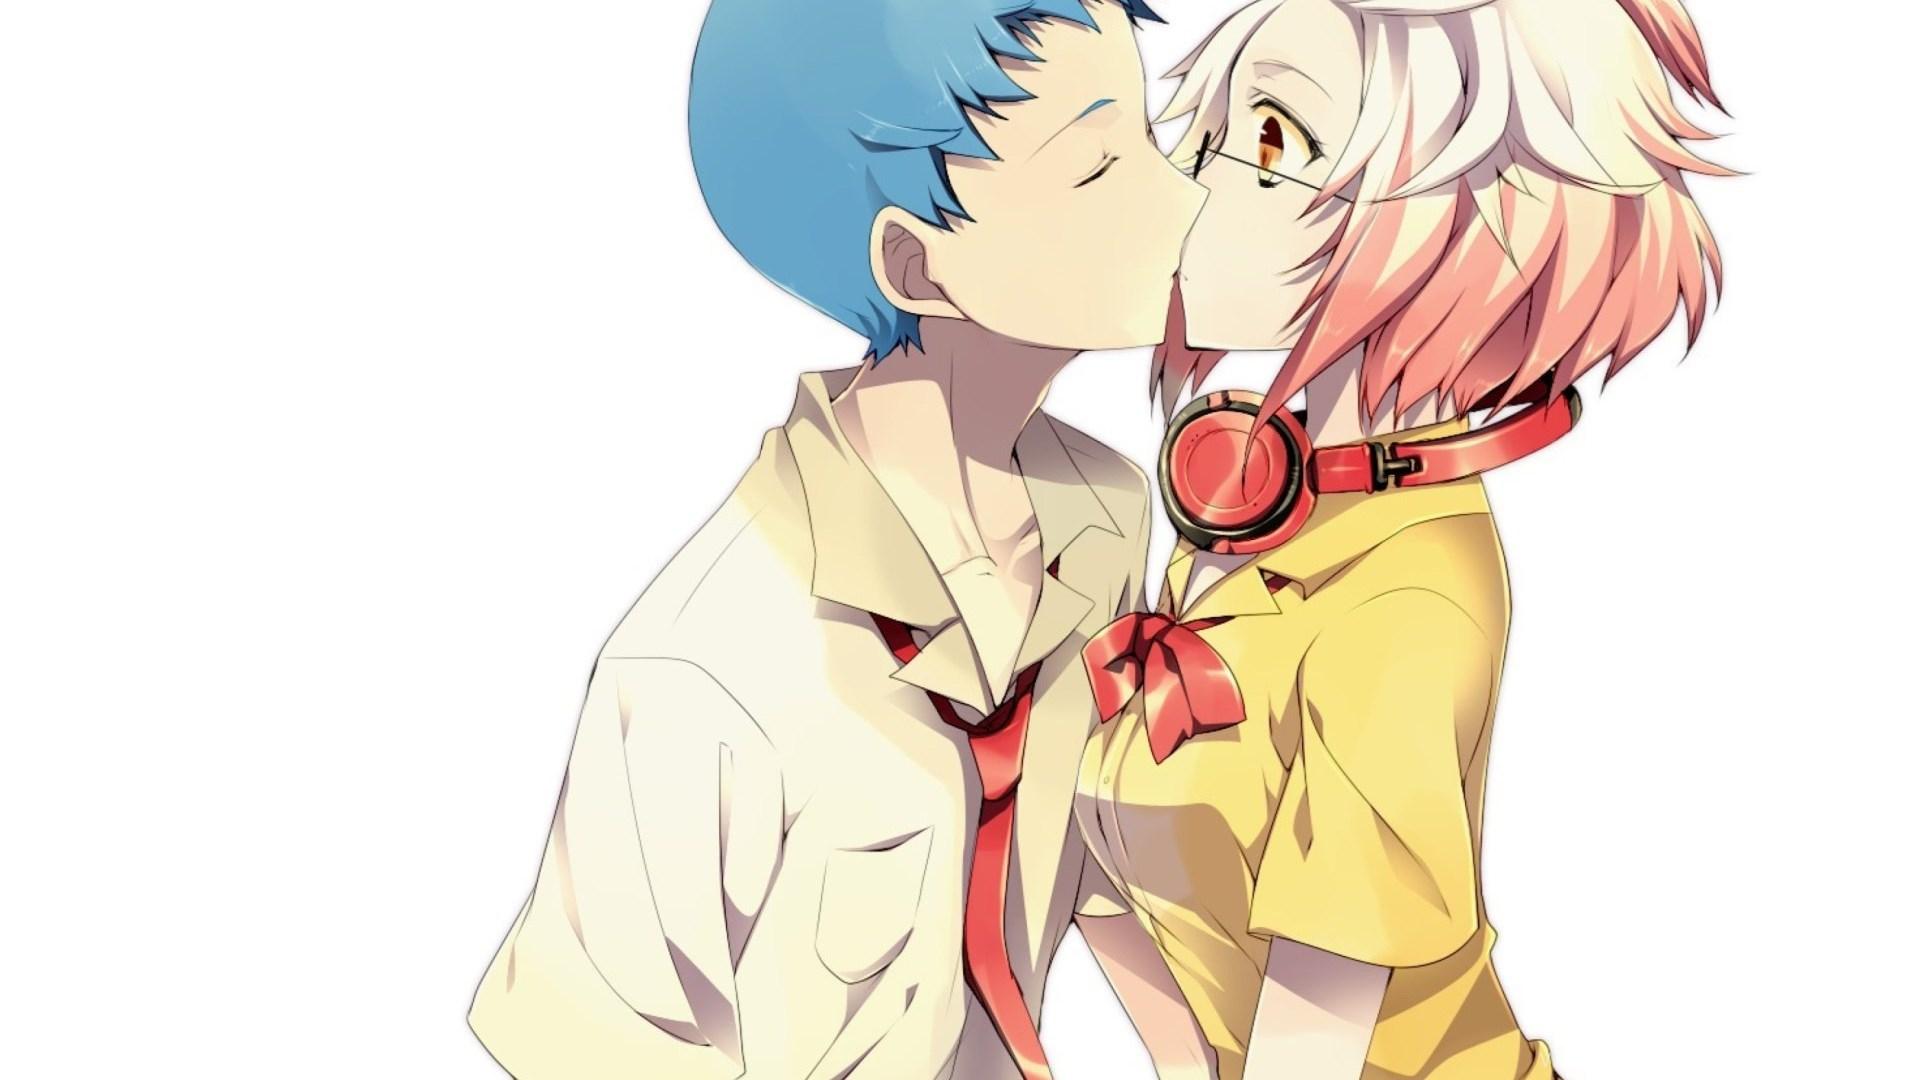 Anime Kiss Wallpapers For LG Nexus 5 Desktop Background